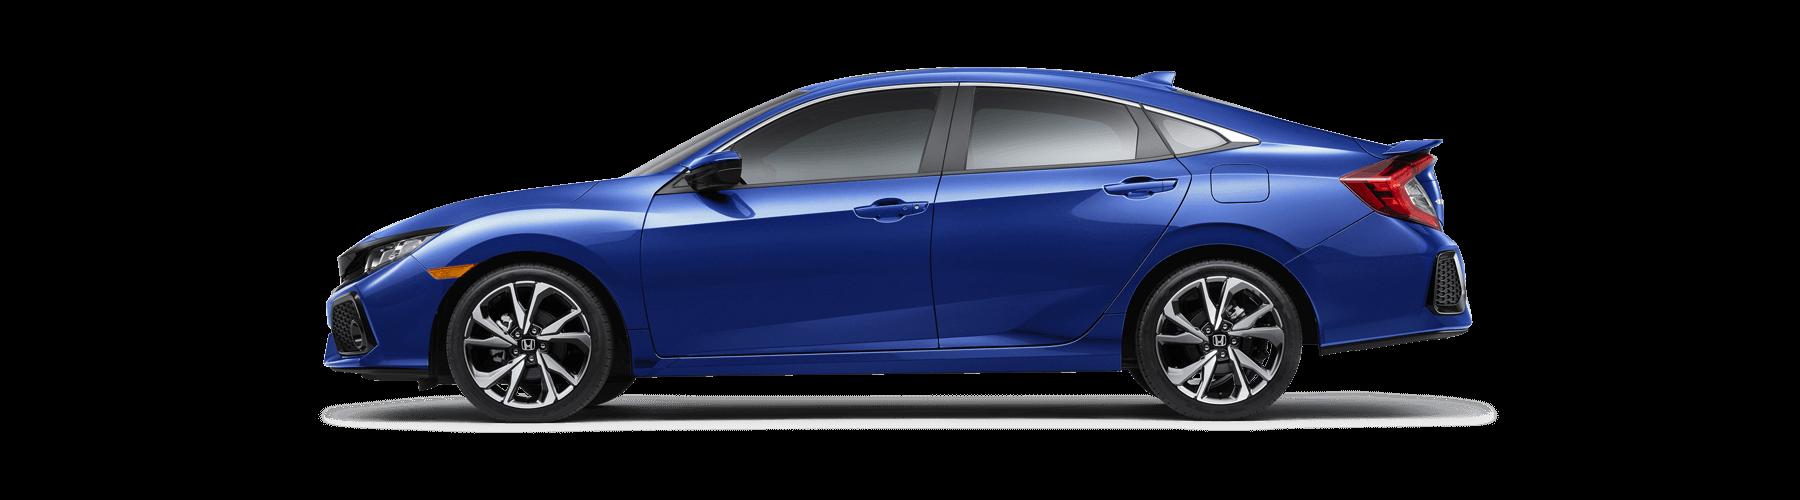 2018 Honda Civic Si Sedan Side Profile